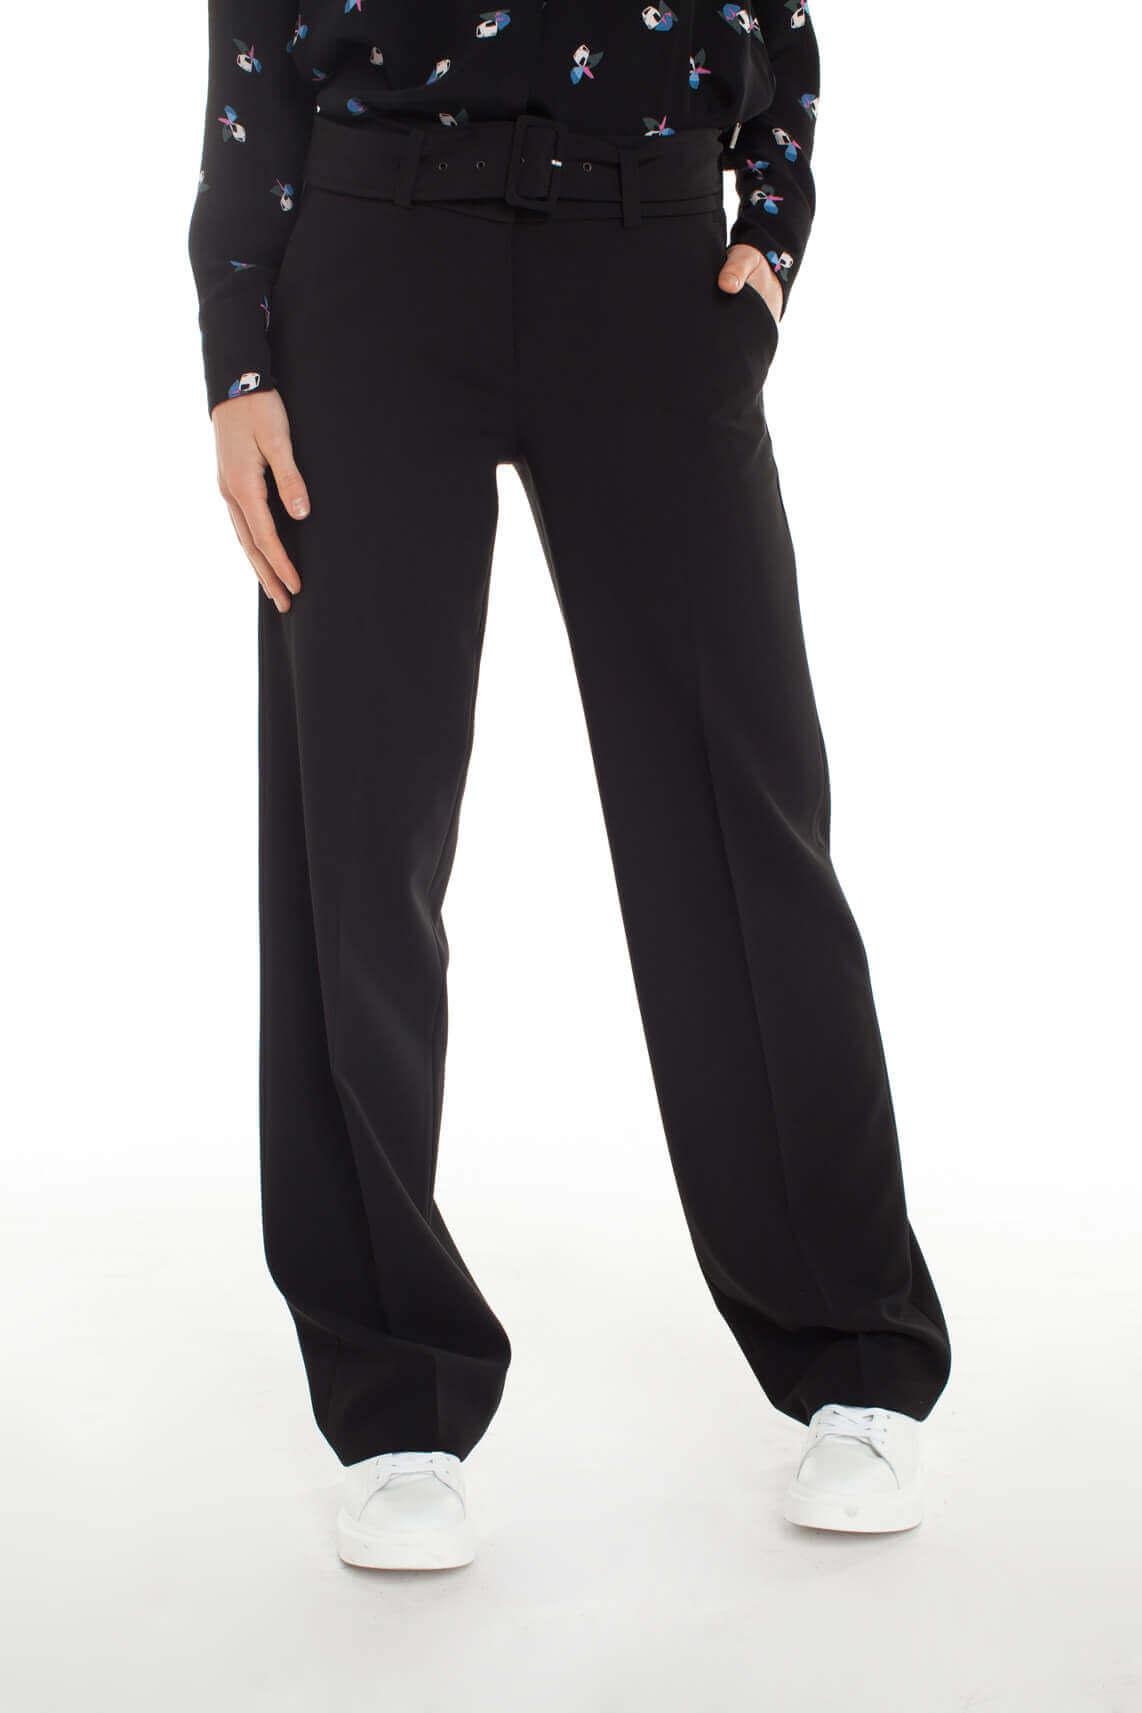 Cambio Dames Maurice wijde pantalon Zwart